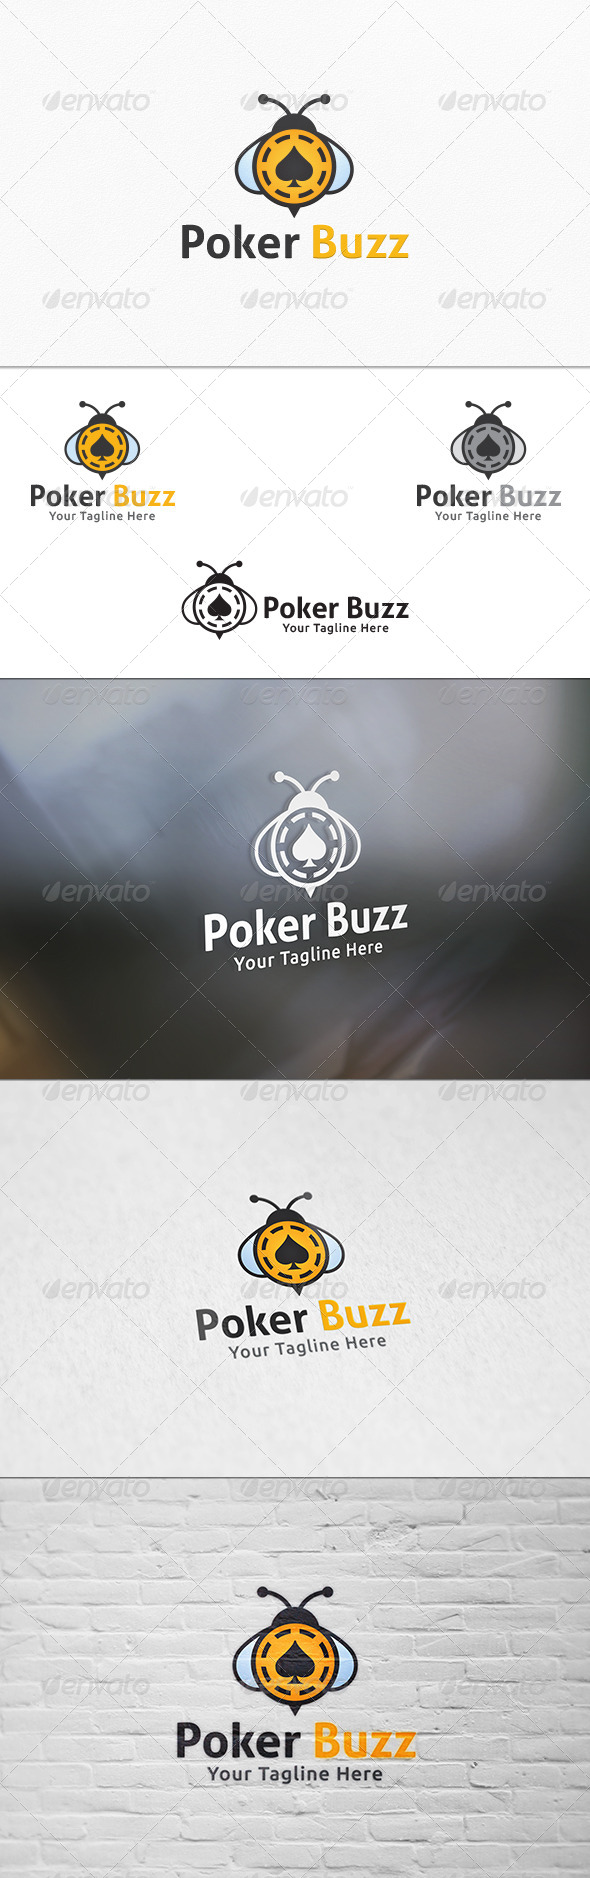 Poker Buzz - Logo Template